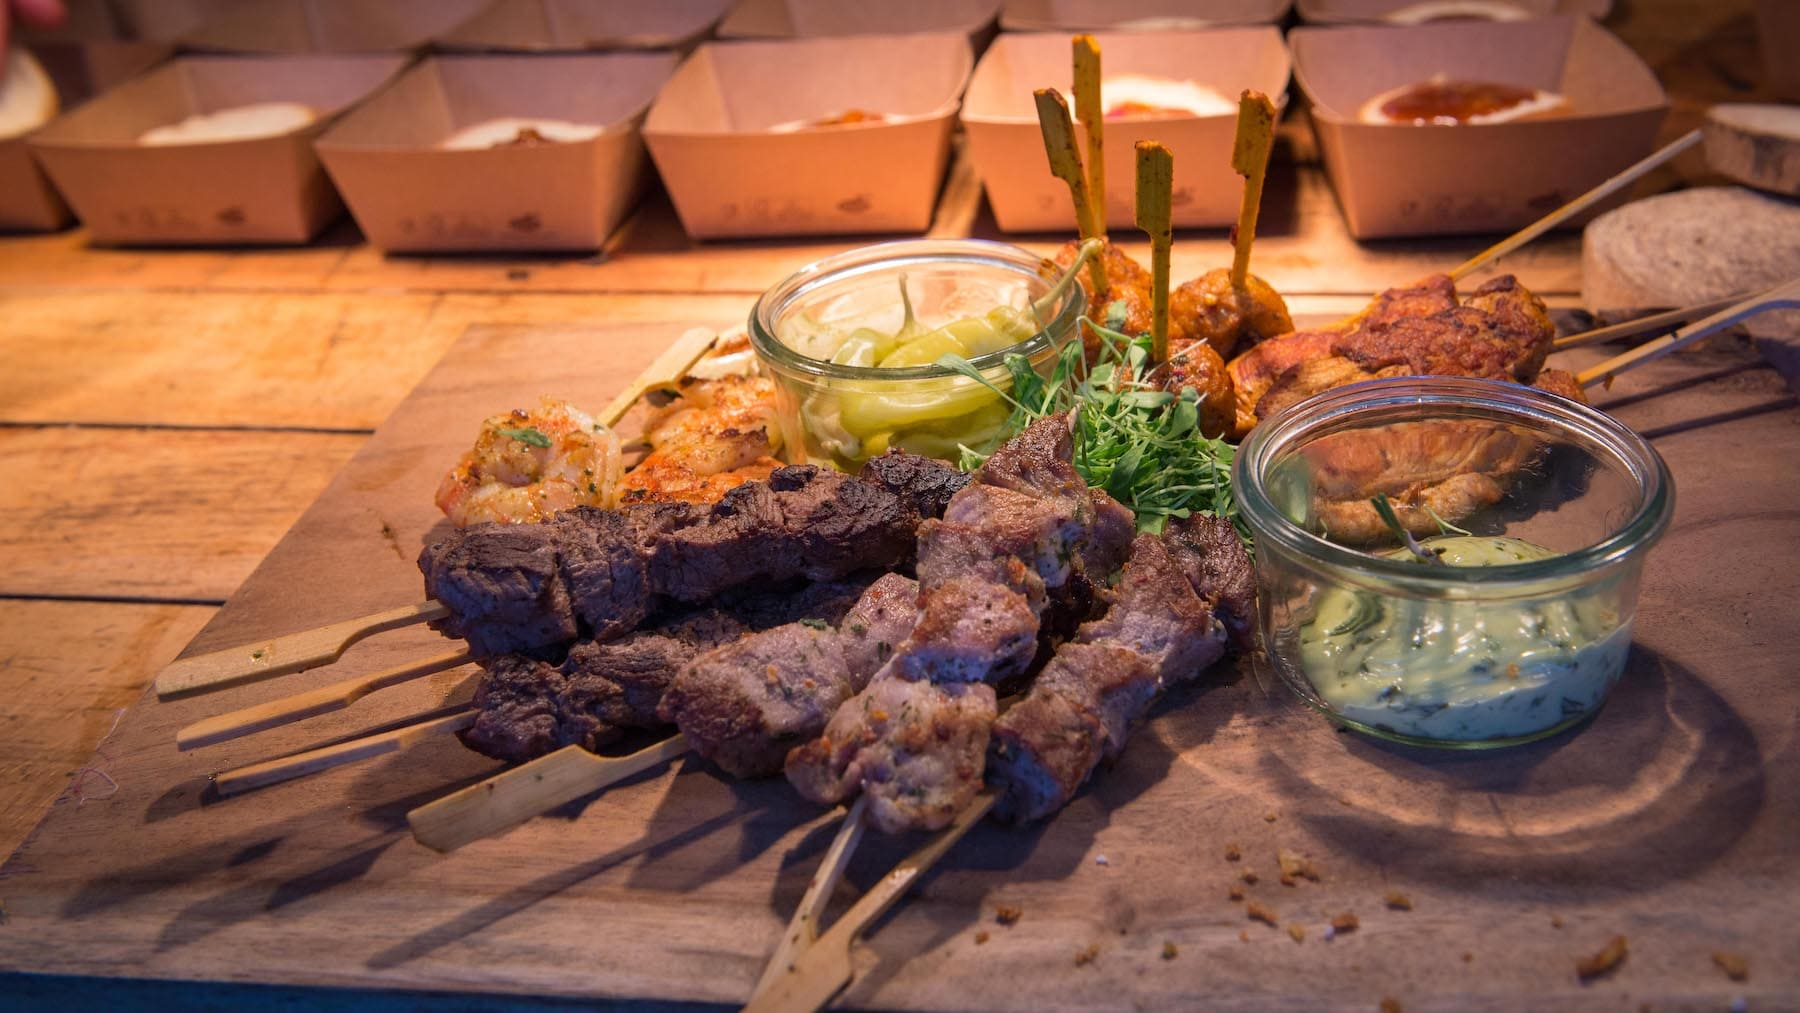 Park Ven souvlaki food bar Diepenbeek